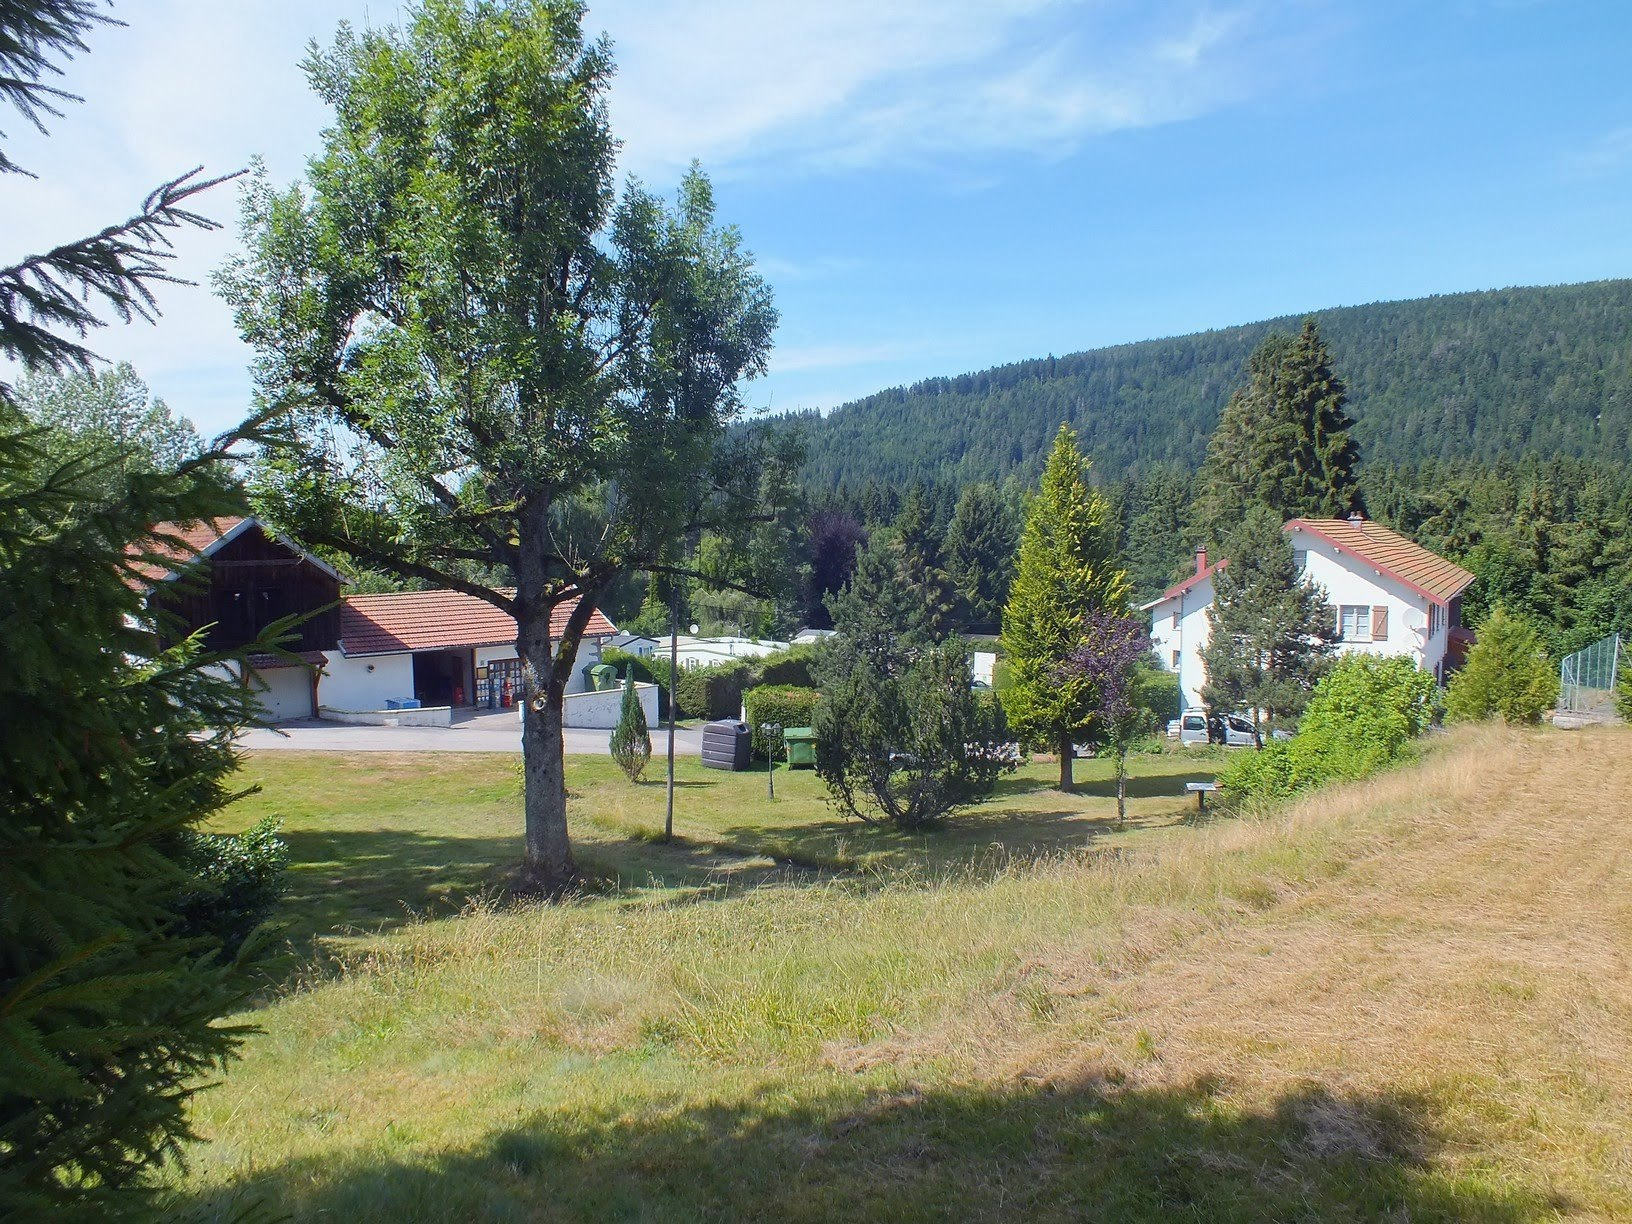 Camping Les Granges-bas